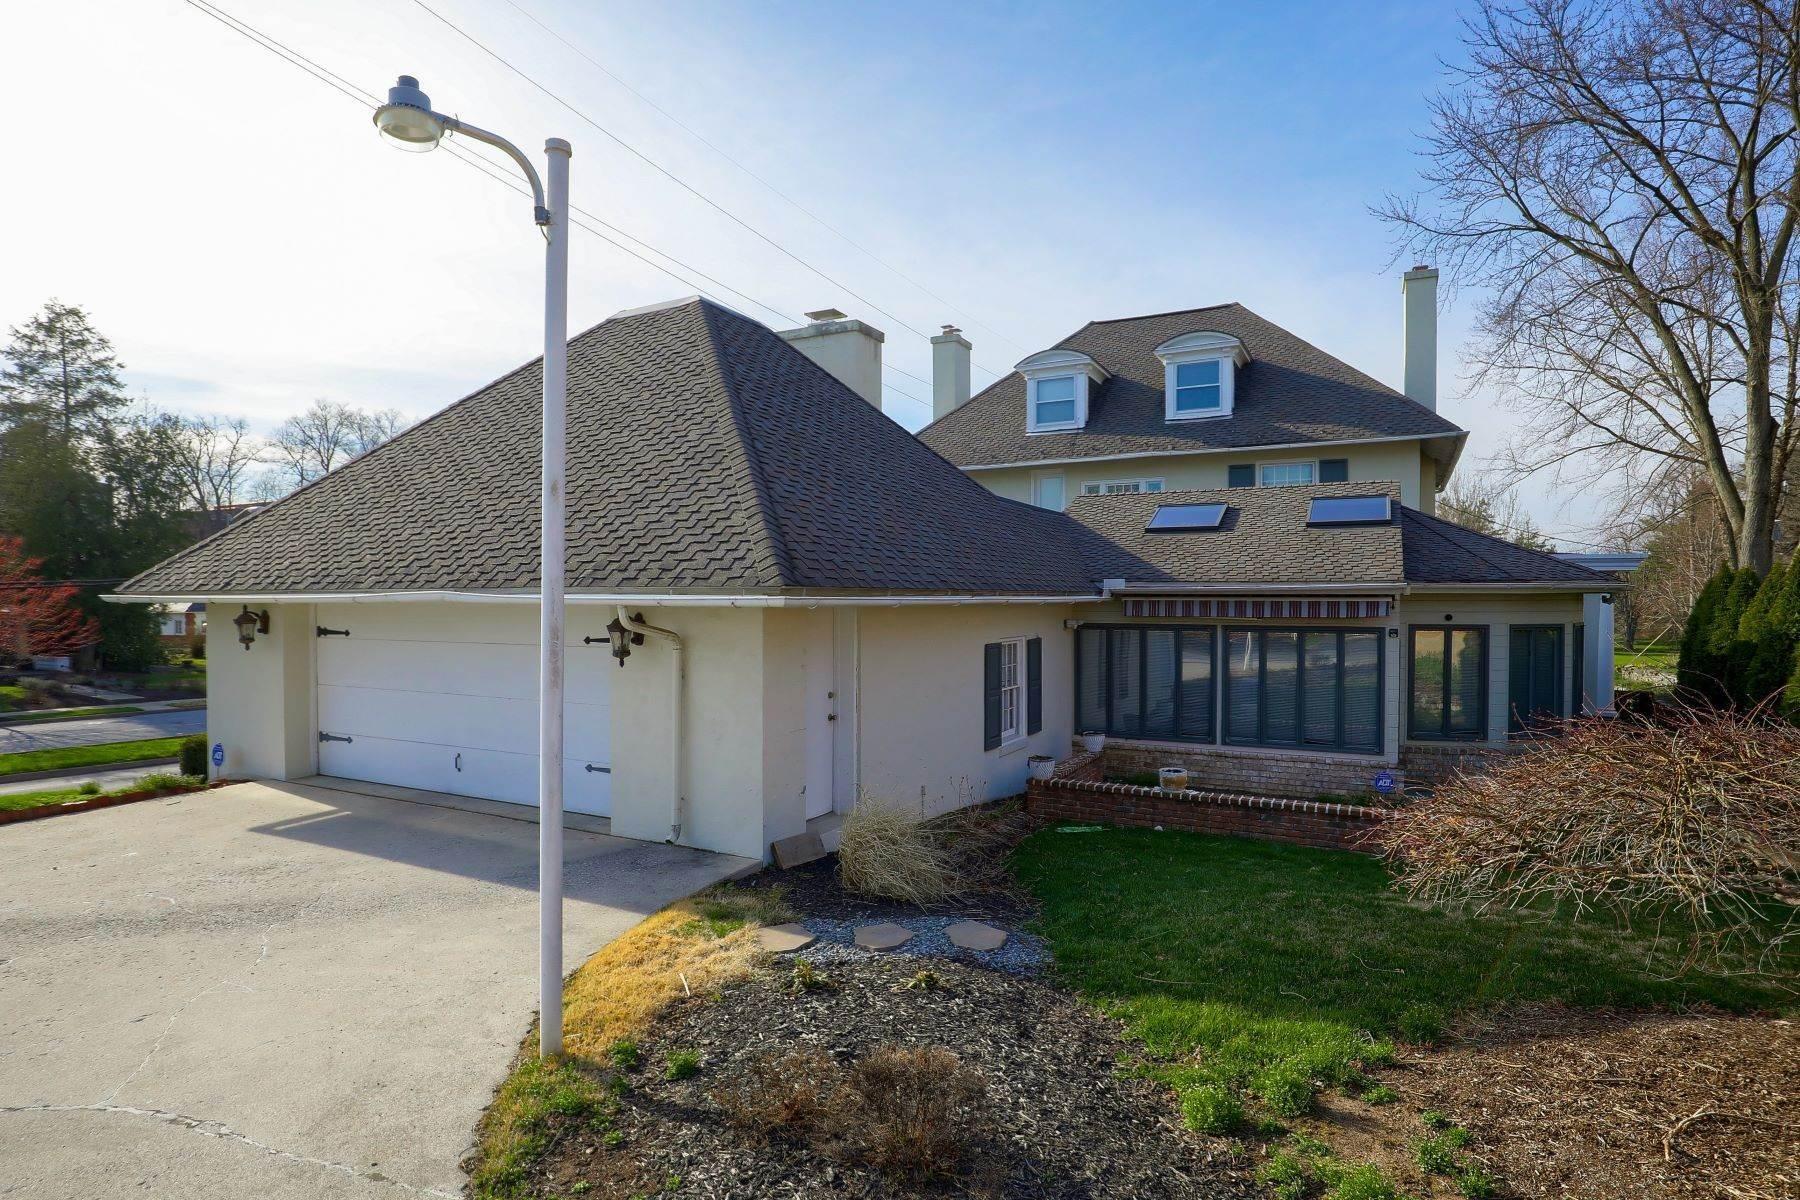 40. Single Family Homes for Sale at 206 E Granada Ave Hershey, Pennsylvania 17033 United States